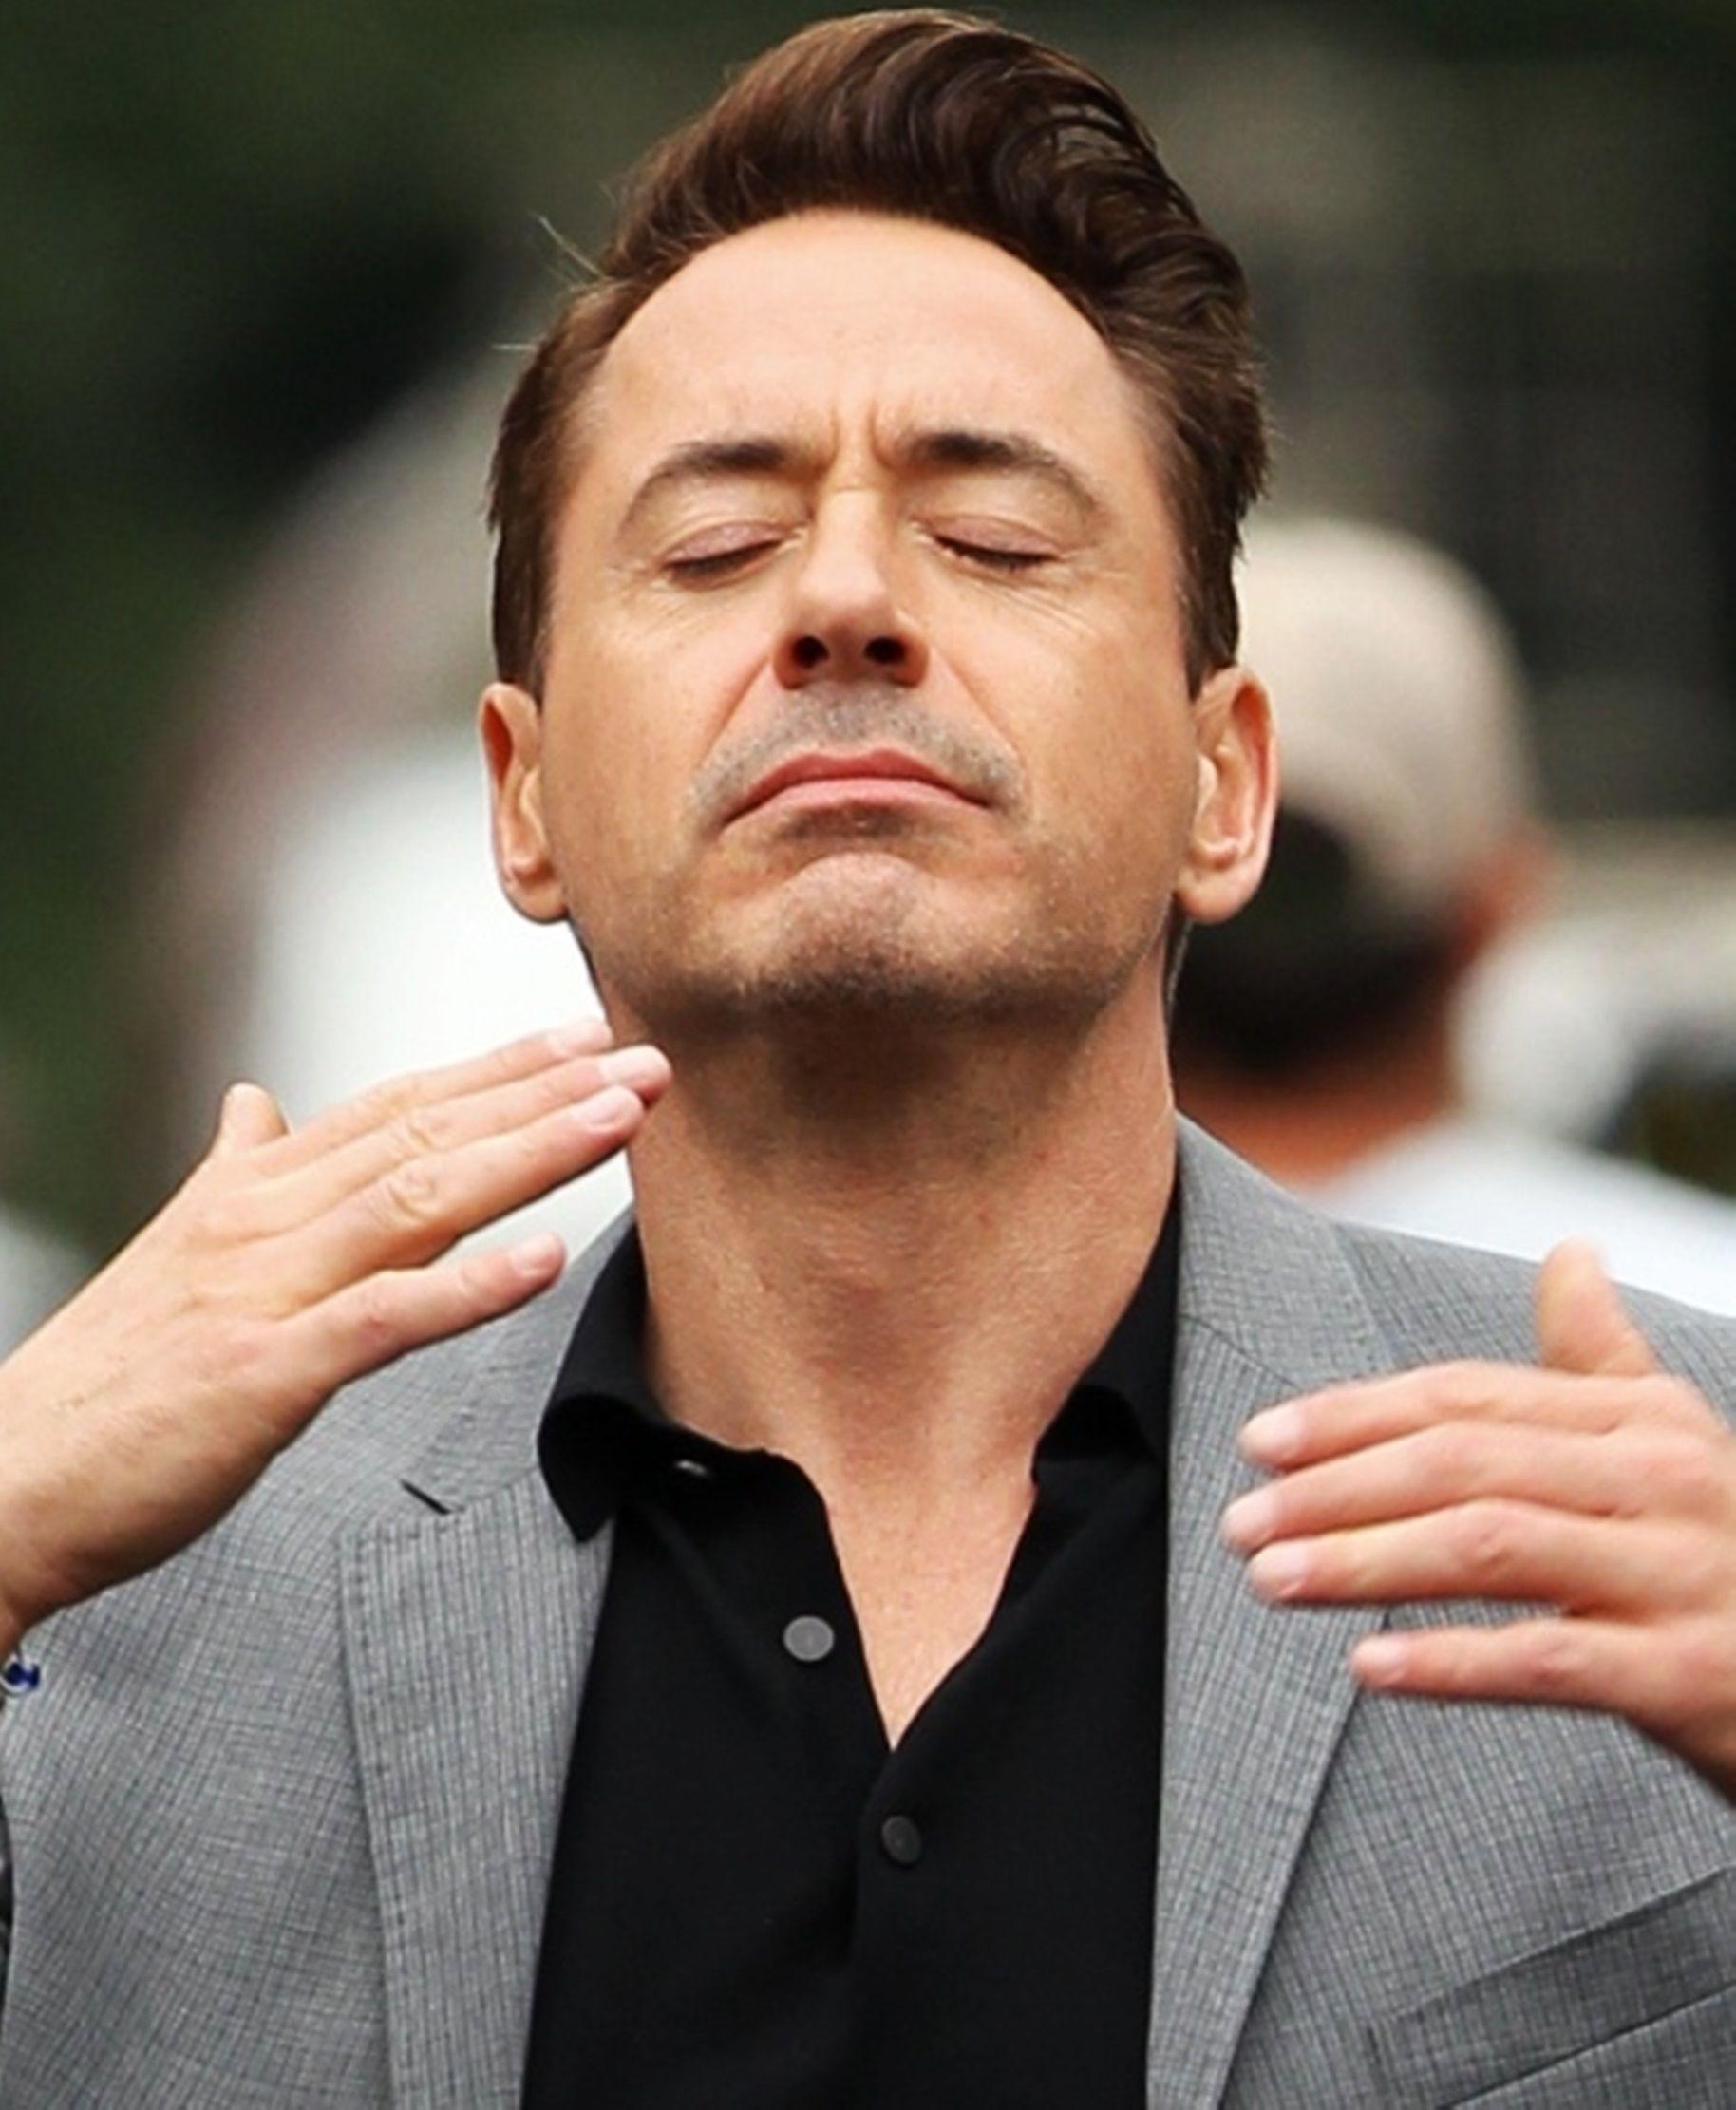 Robert Downey Jr. It looks like he is about to sneeze